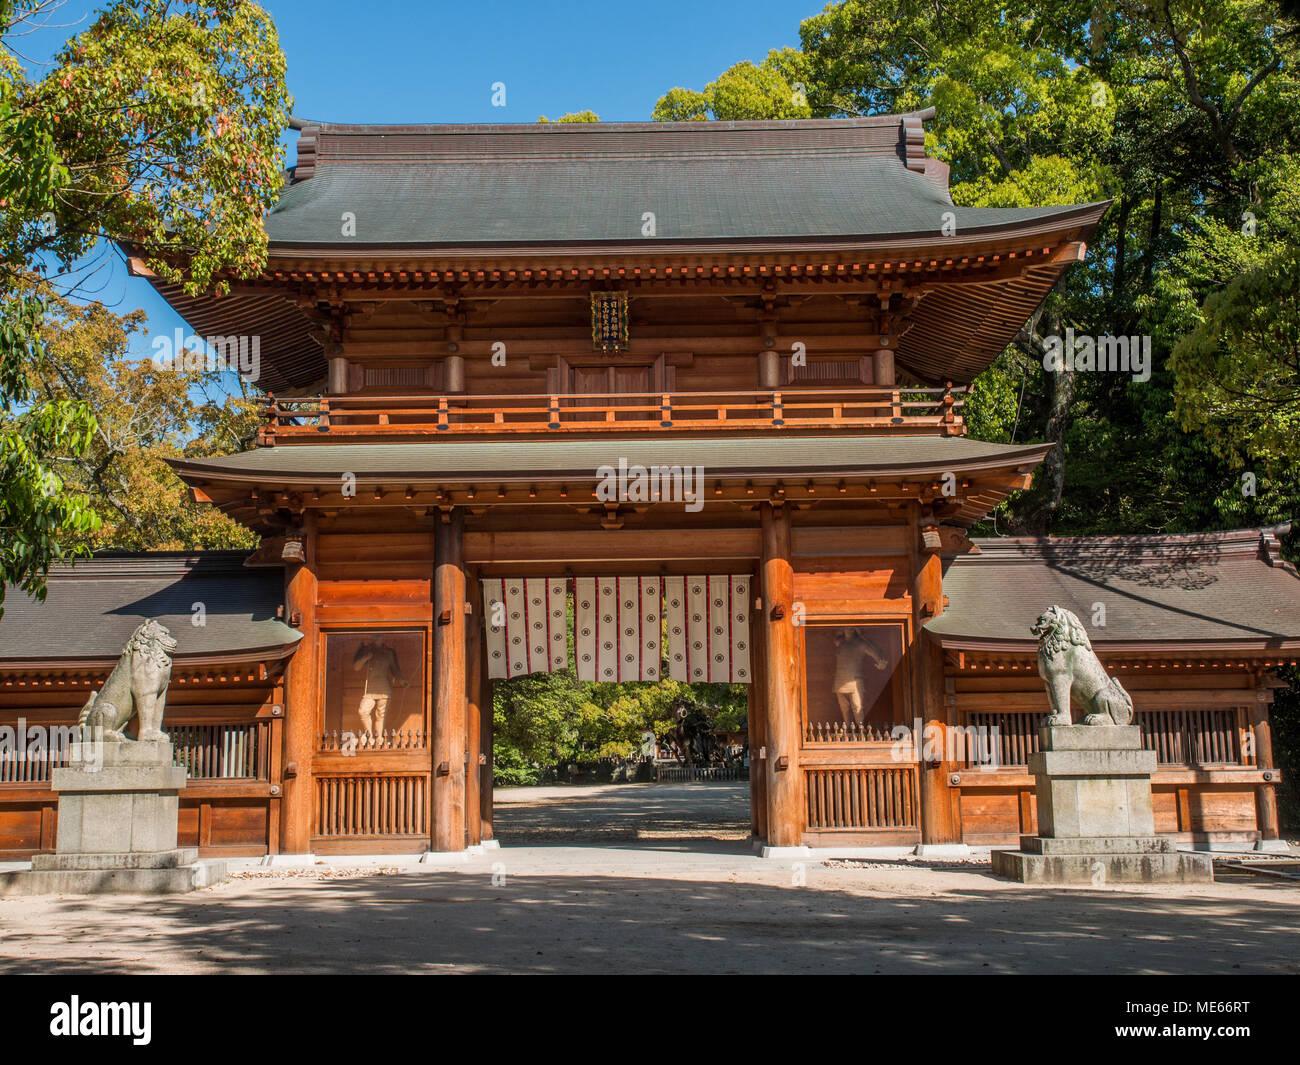 Main gate, Ōyamazumi Jinja, , Omishima island,  Seto Inland Sea, Japan - Stock Image